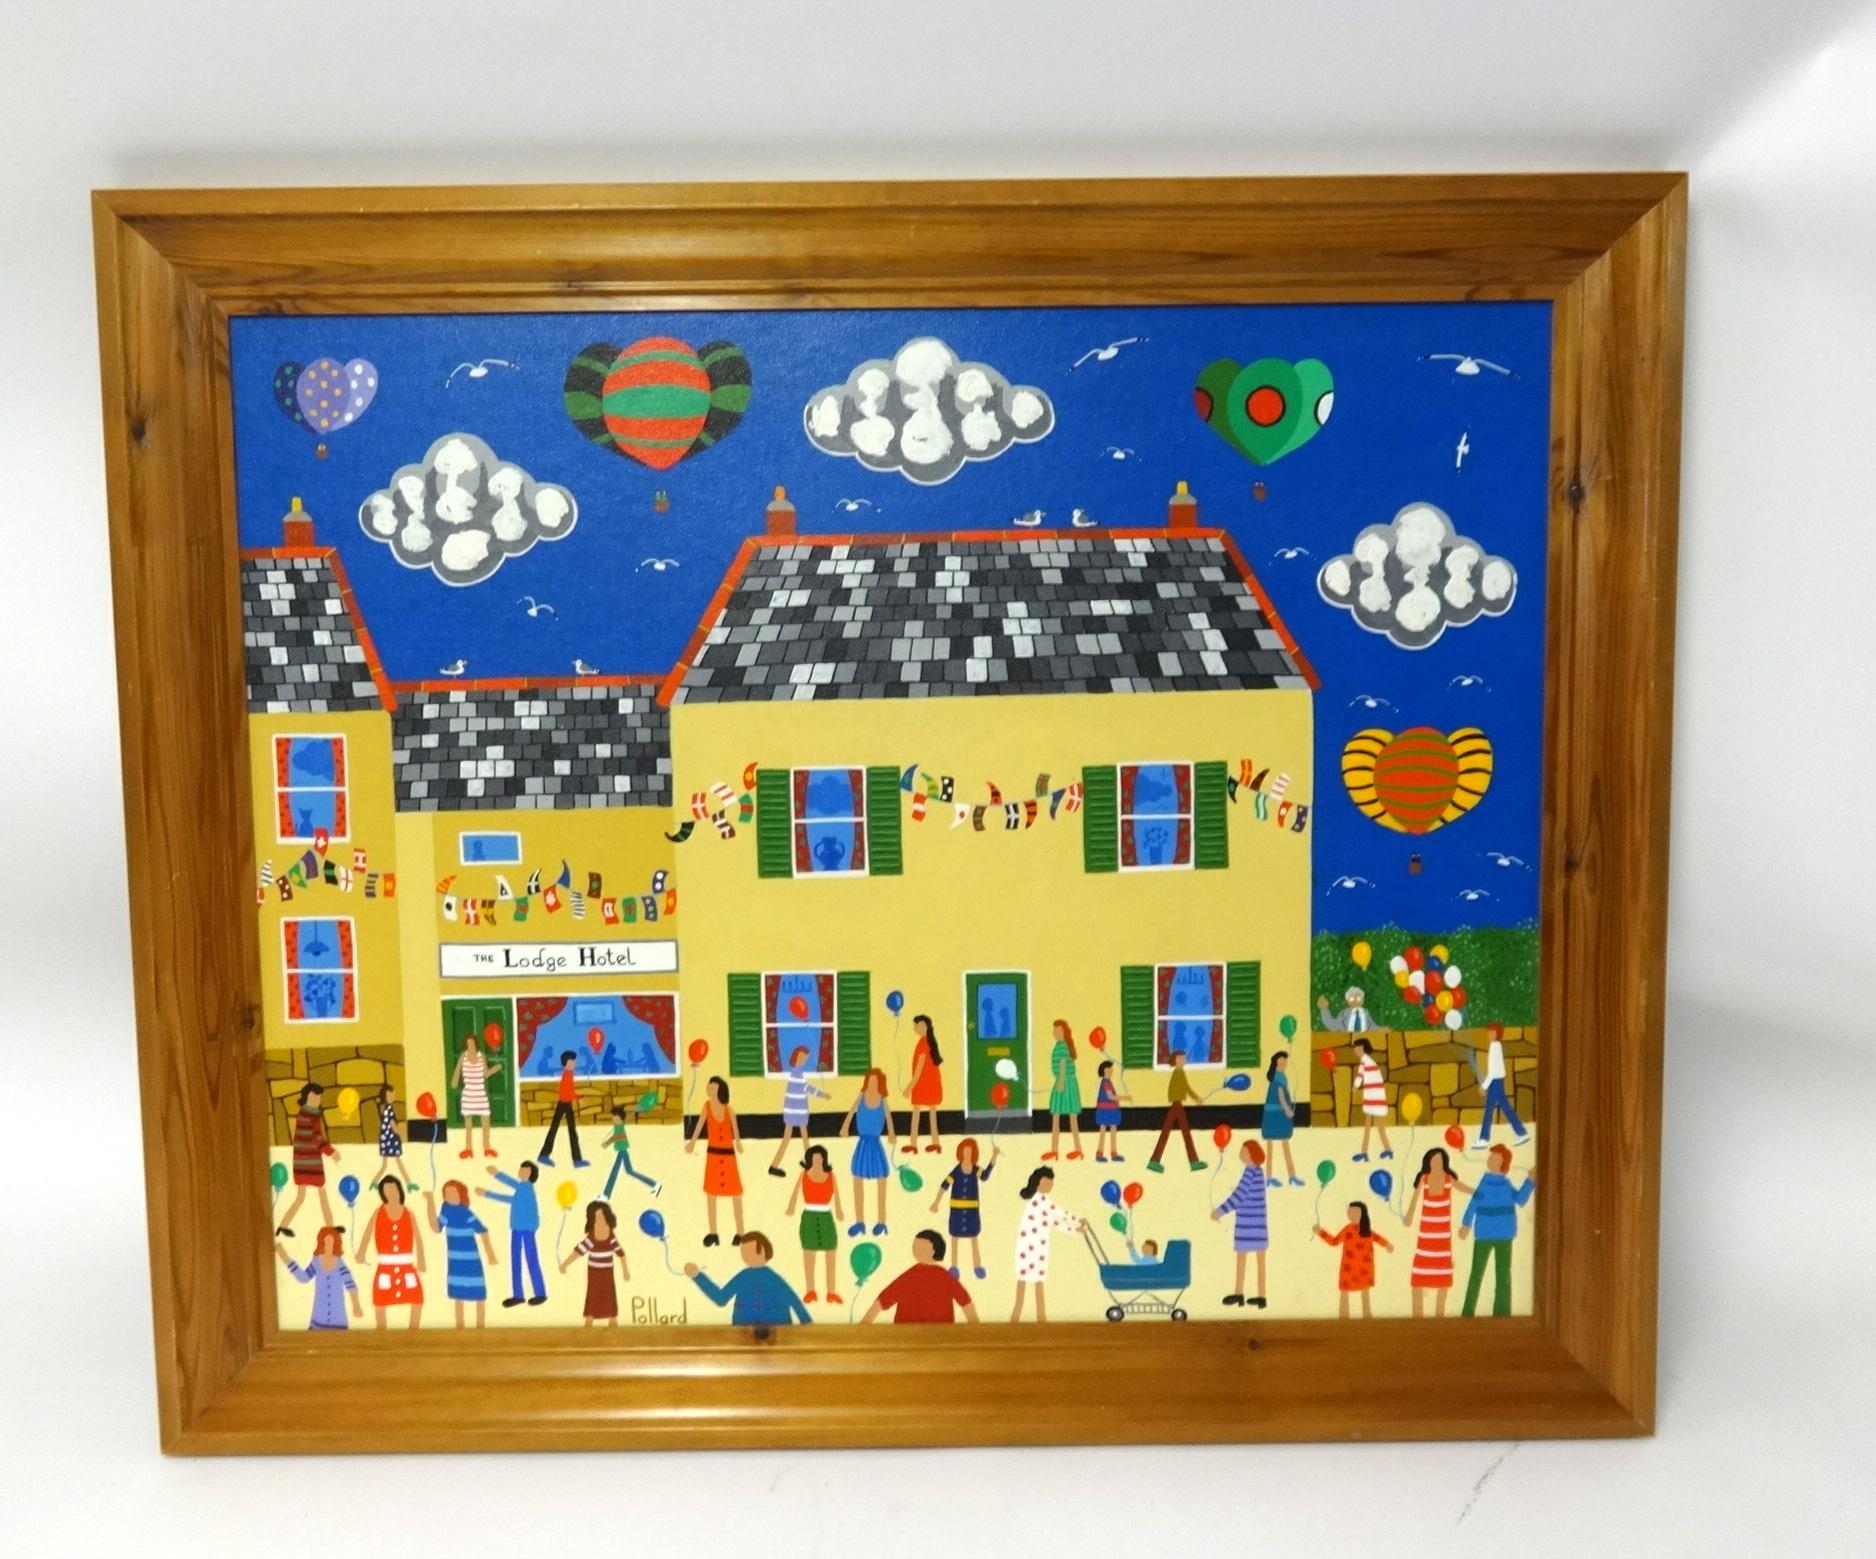 Lot 012 - Brian Pollard, original acrylic on board, signed 'The Lodge Hotel, Kingsbridge', 59cm x 74cm,